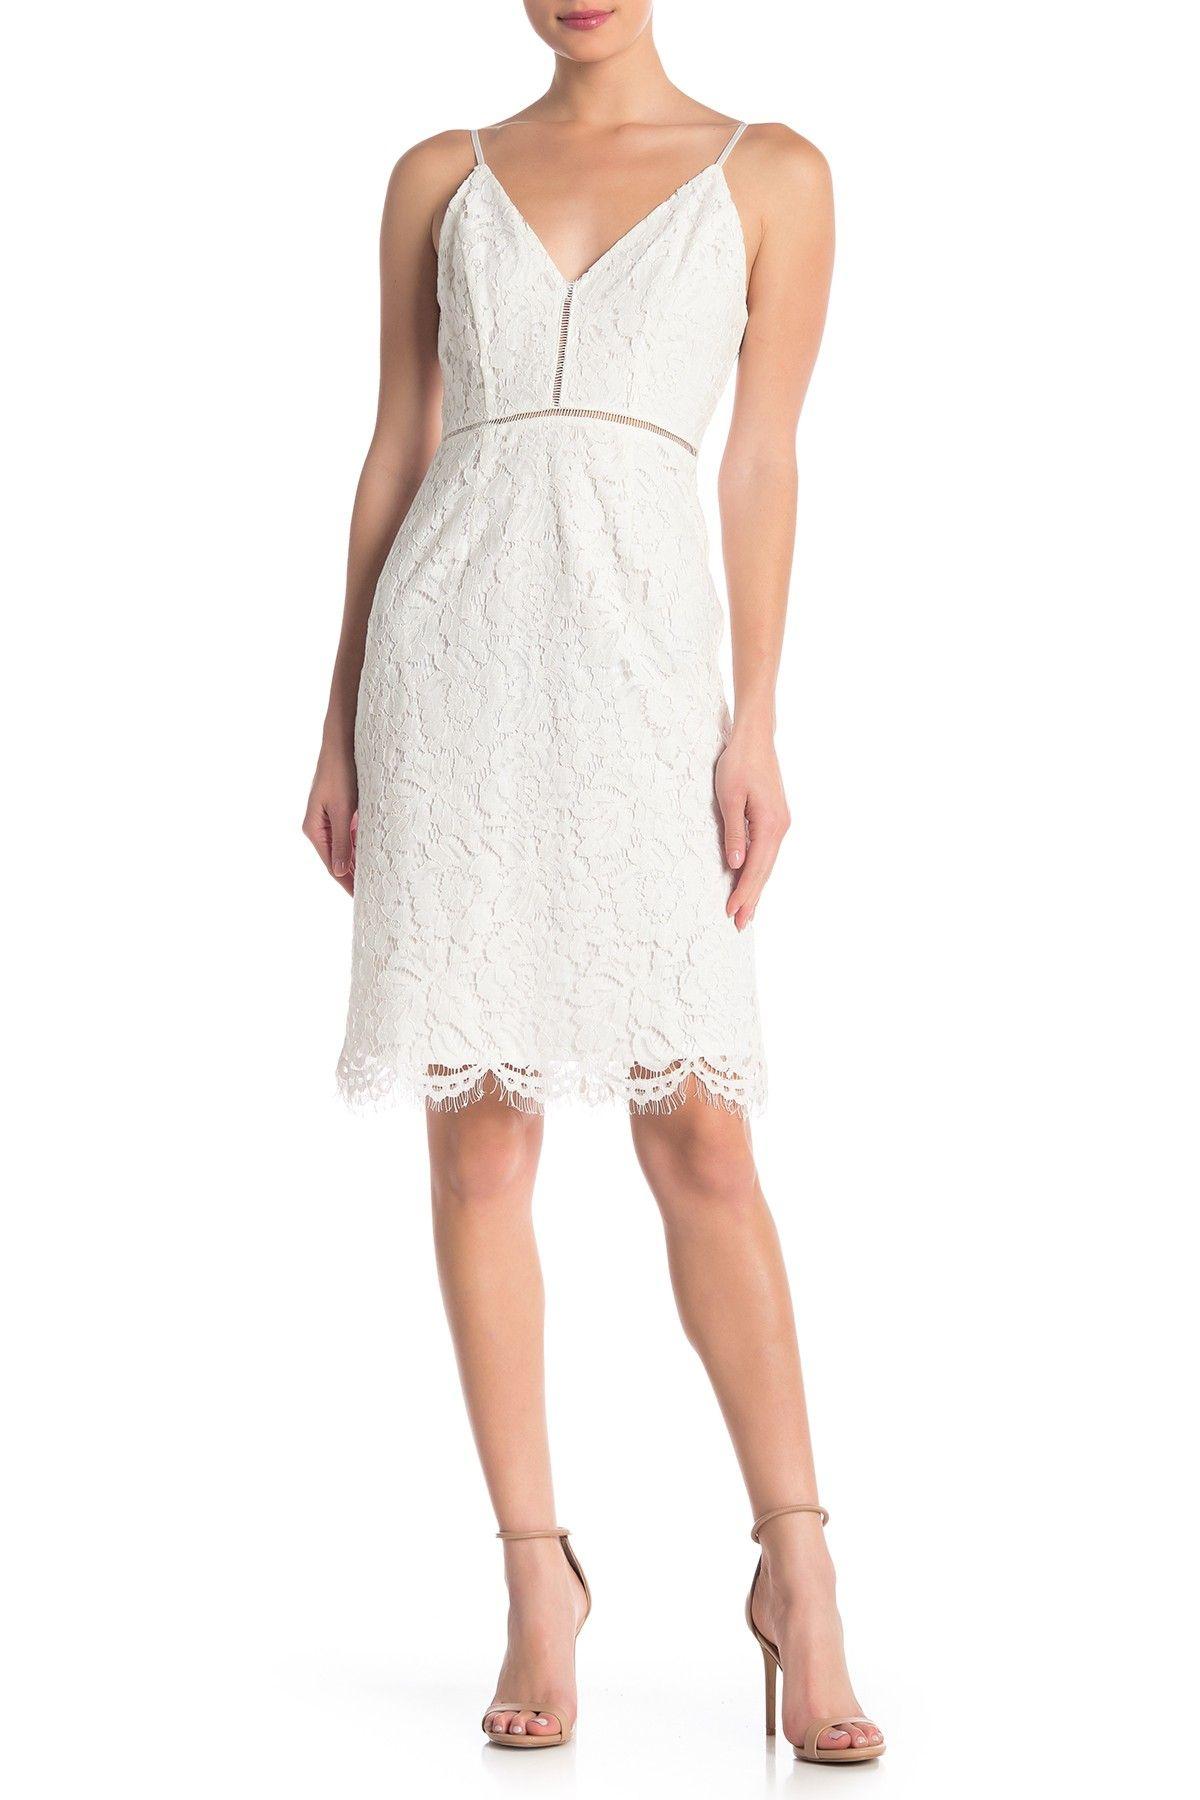 Astr The Label Lace V Neck Sheath Dress Nordstrom Rack Lace Dress Nordstrom Dresses Sheath Dress [ 1800 x 1200 Pixel ]